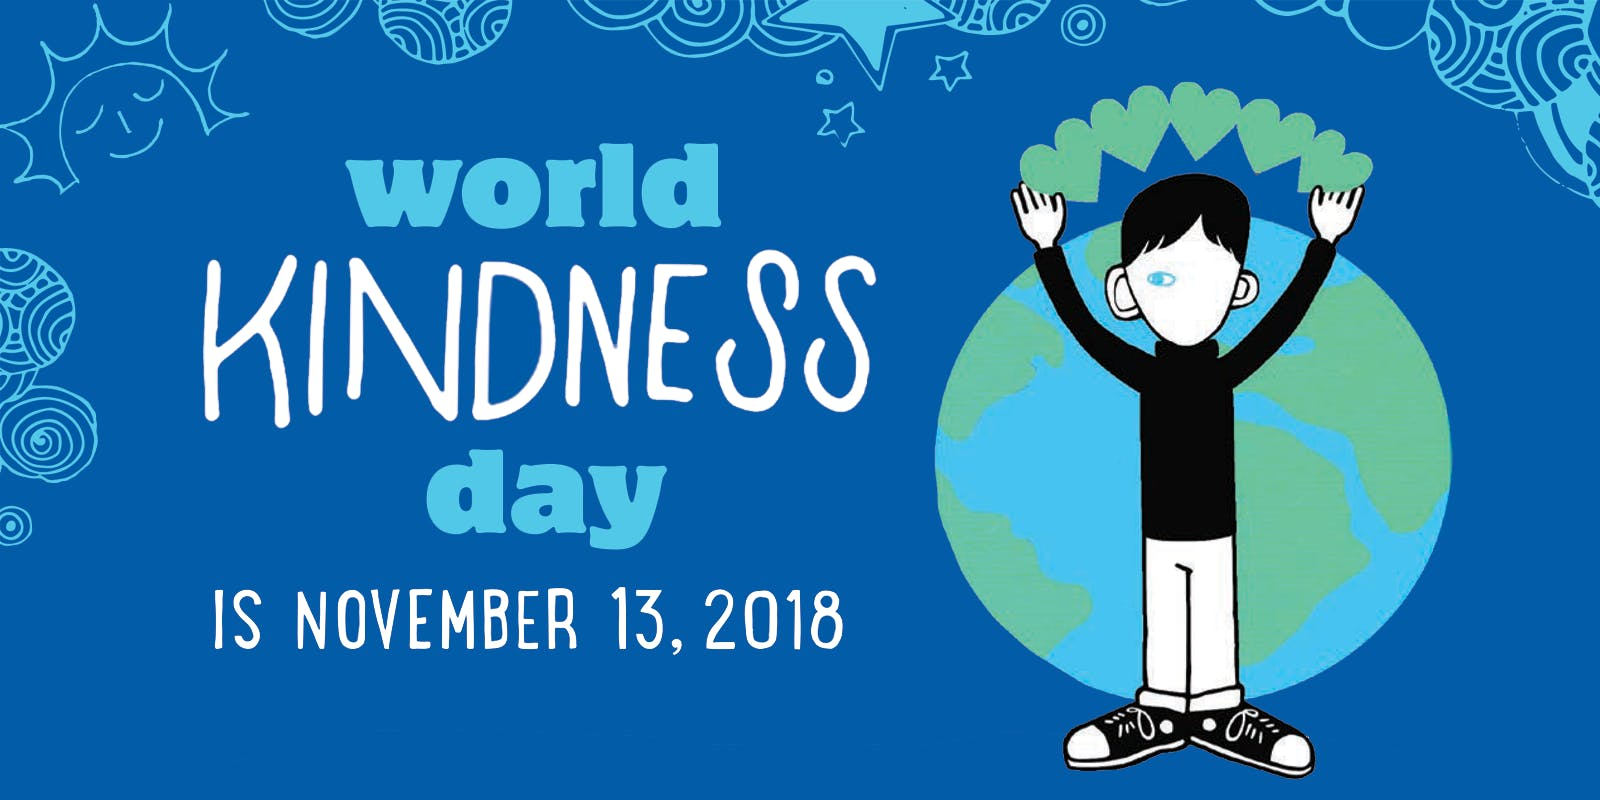 Celebrate World Kindness Day 2018 with Wonder